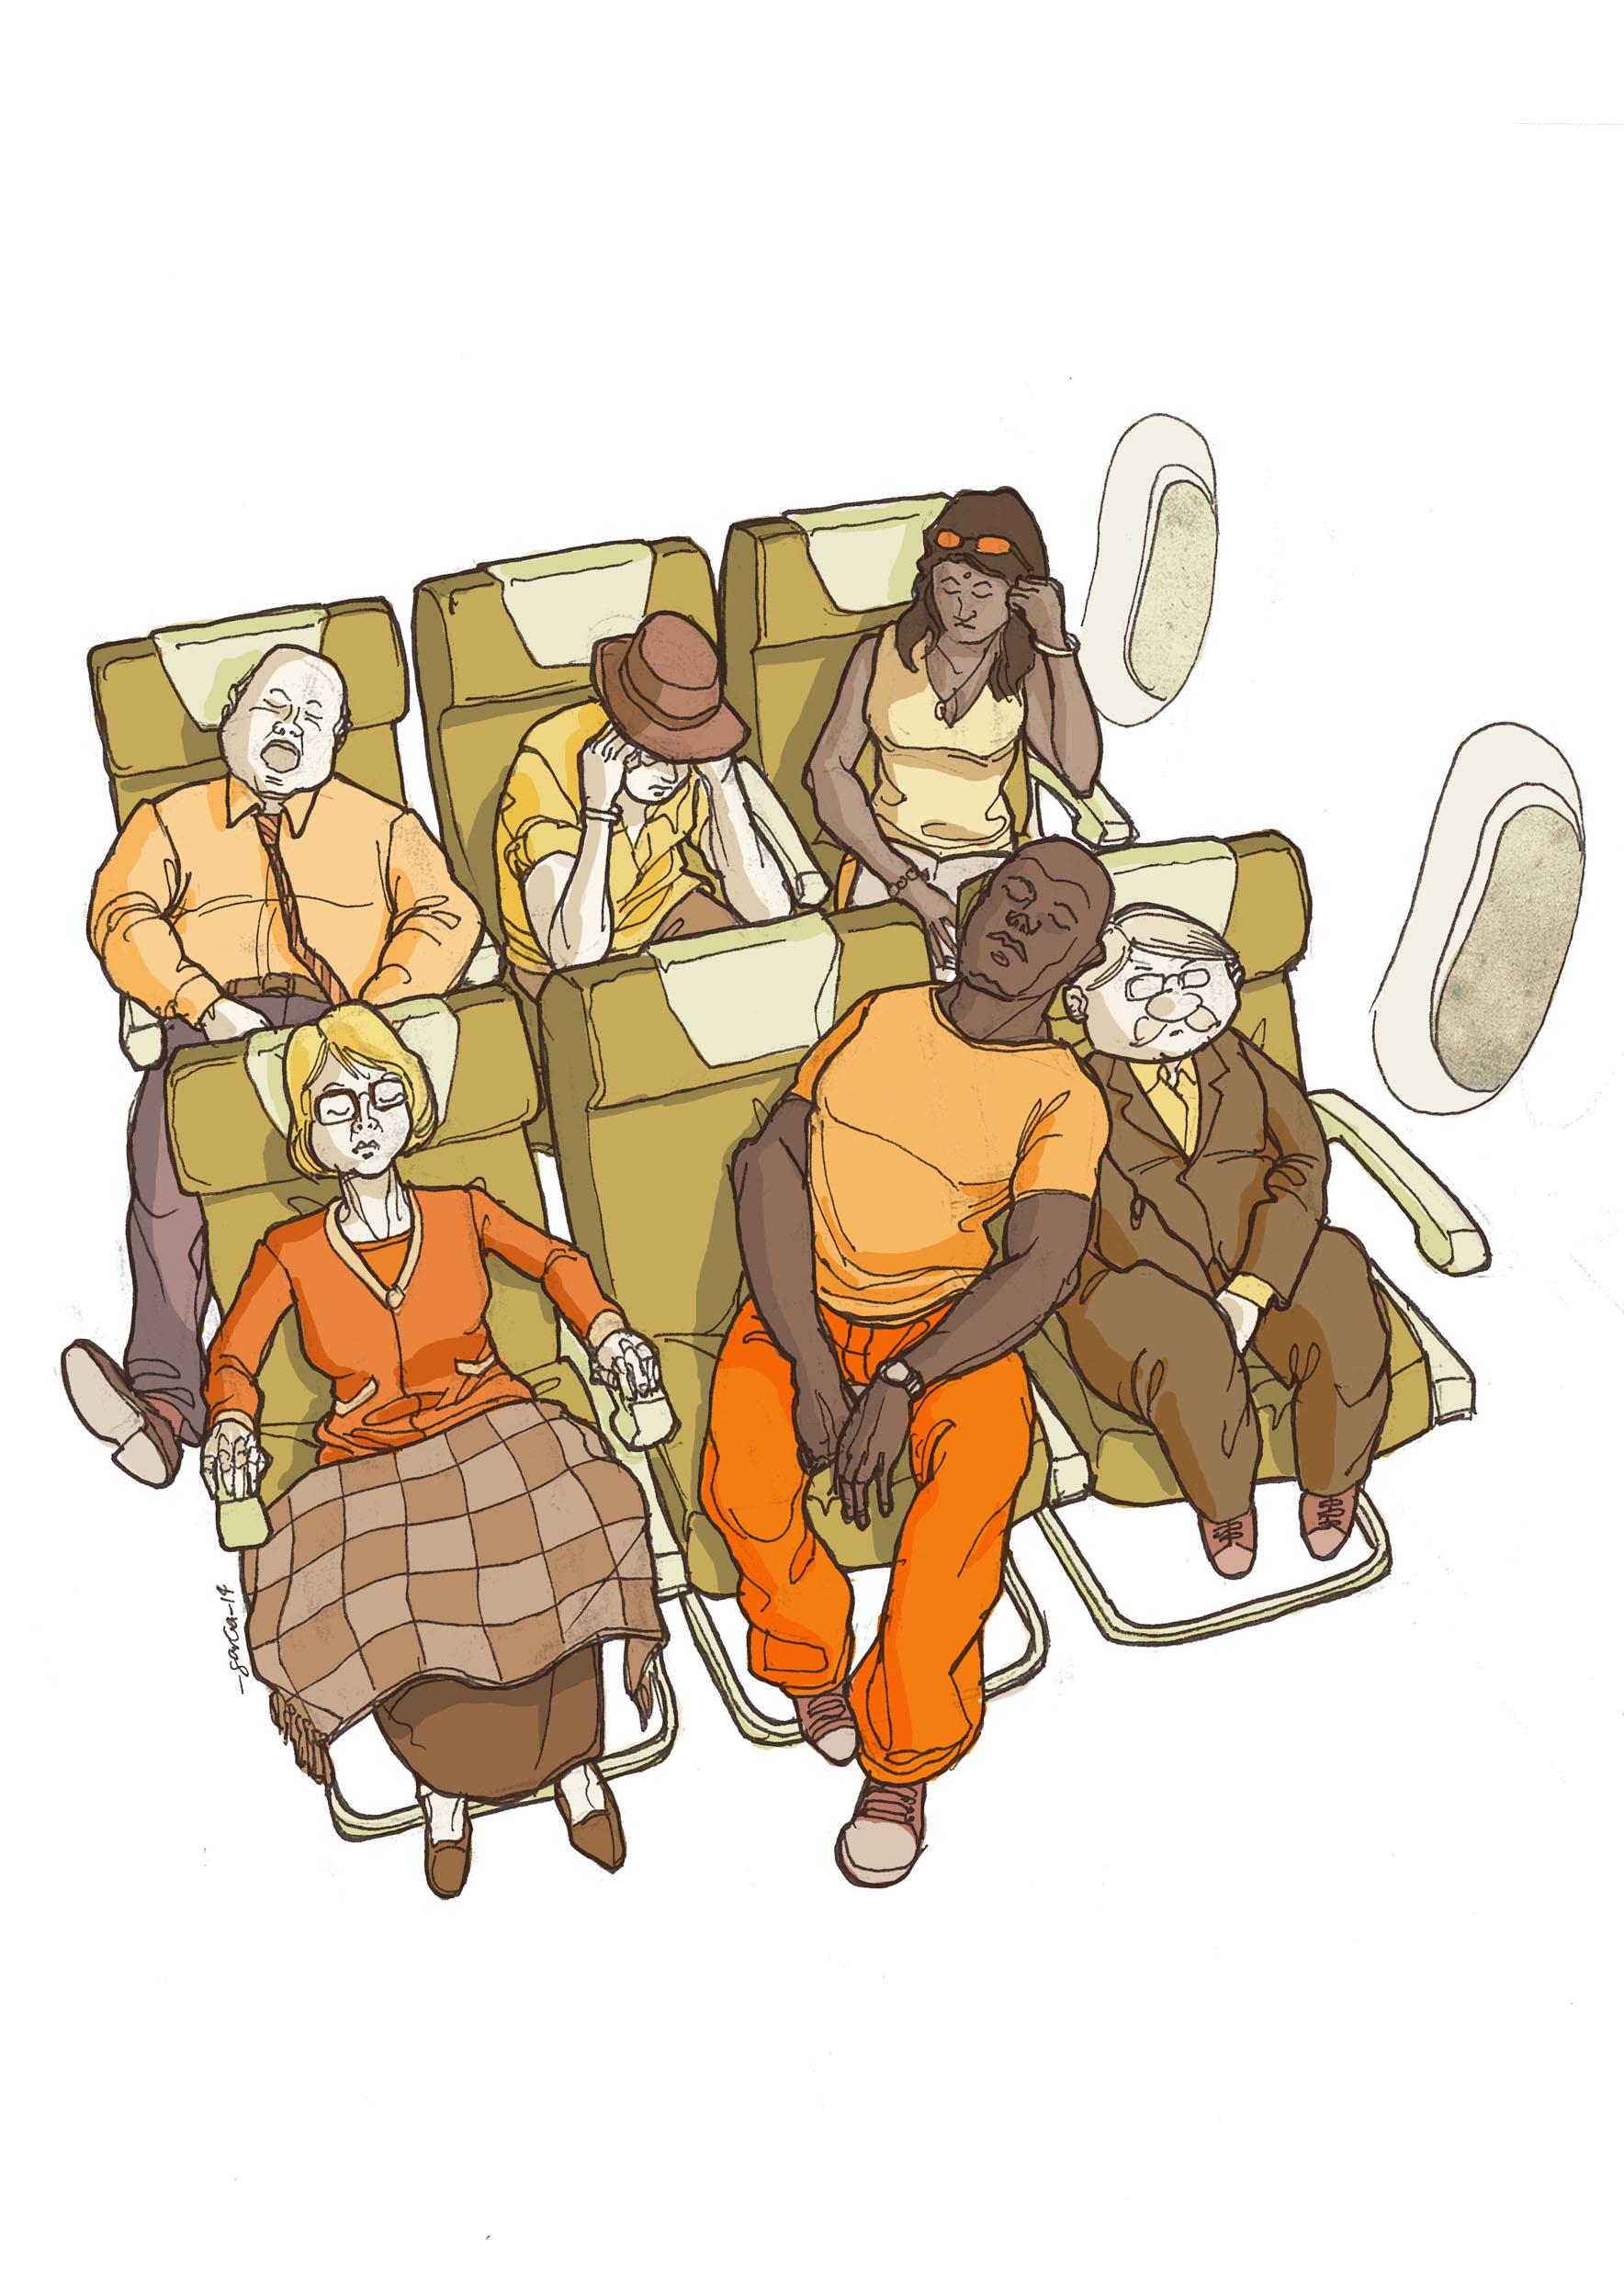 daniel-garcia-art-illustration-sleep-on-plane-national-geographic-traveler-01